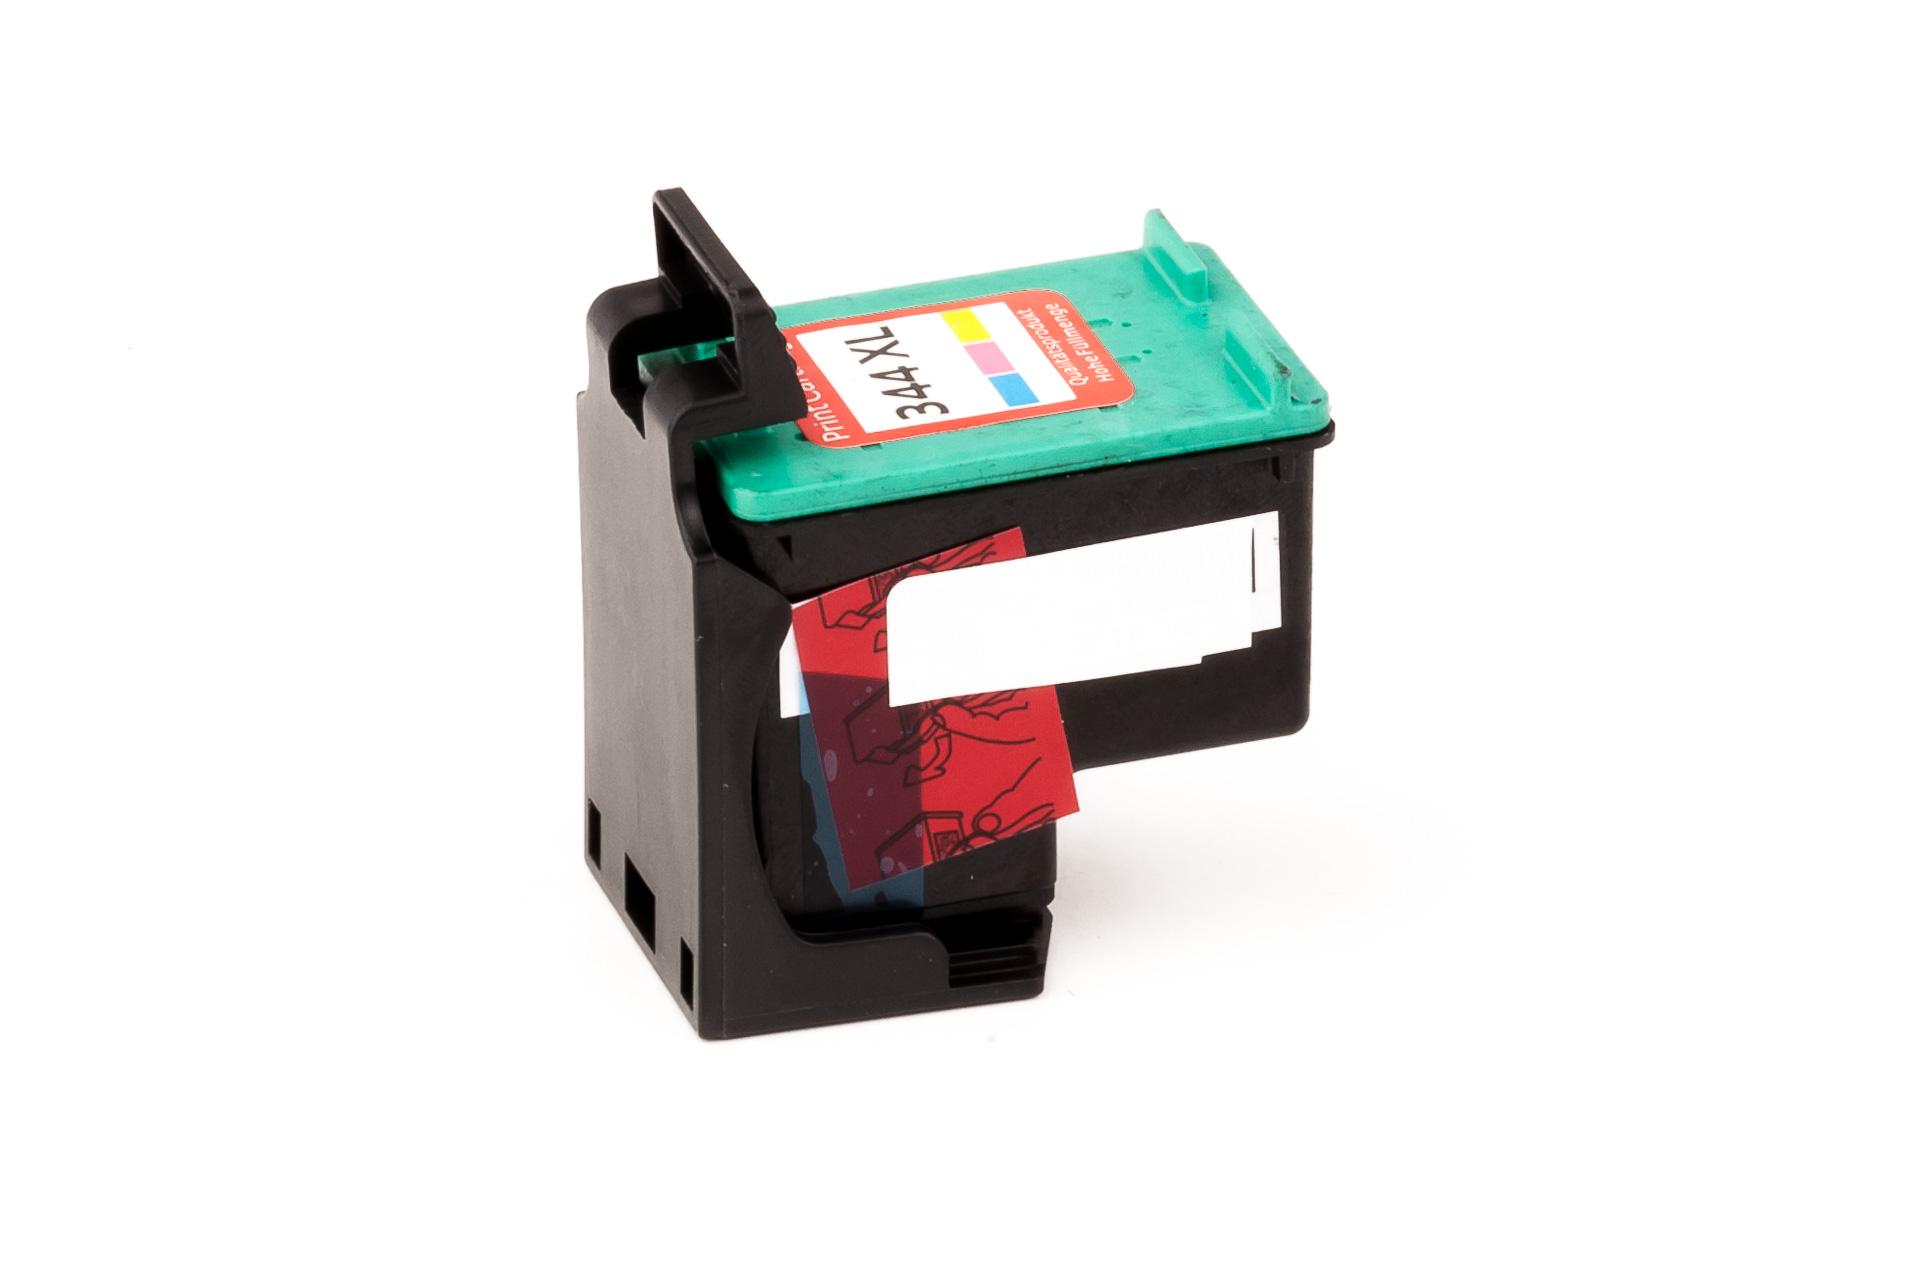 ASC-Premium-Druckkopf für HP OfficeJet 150 Mobile color OfficeJet 150 Mobile OfficeJet150Mobile